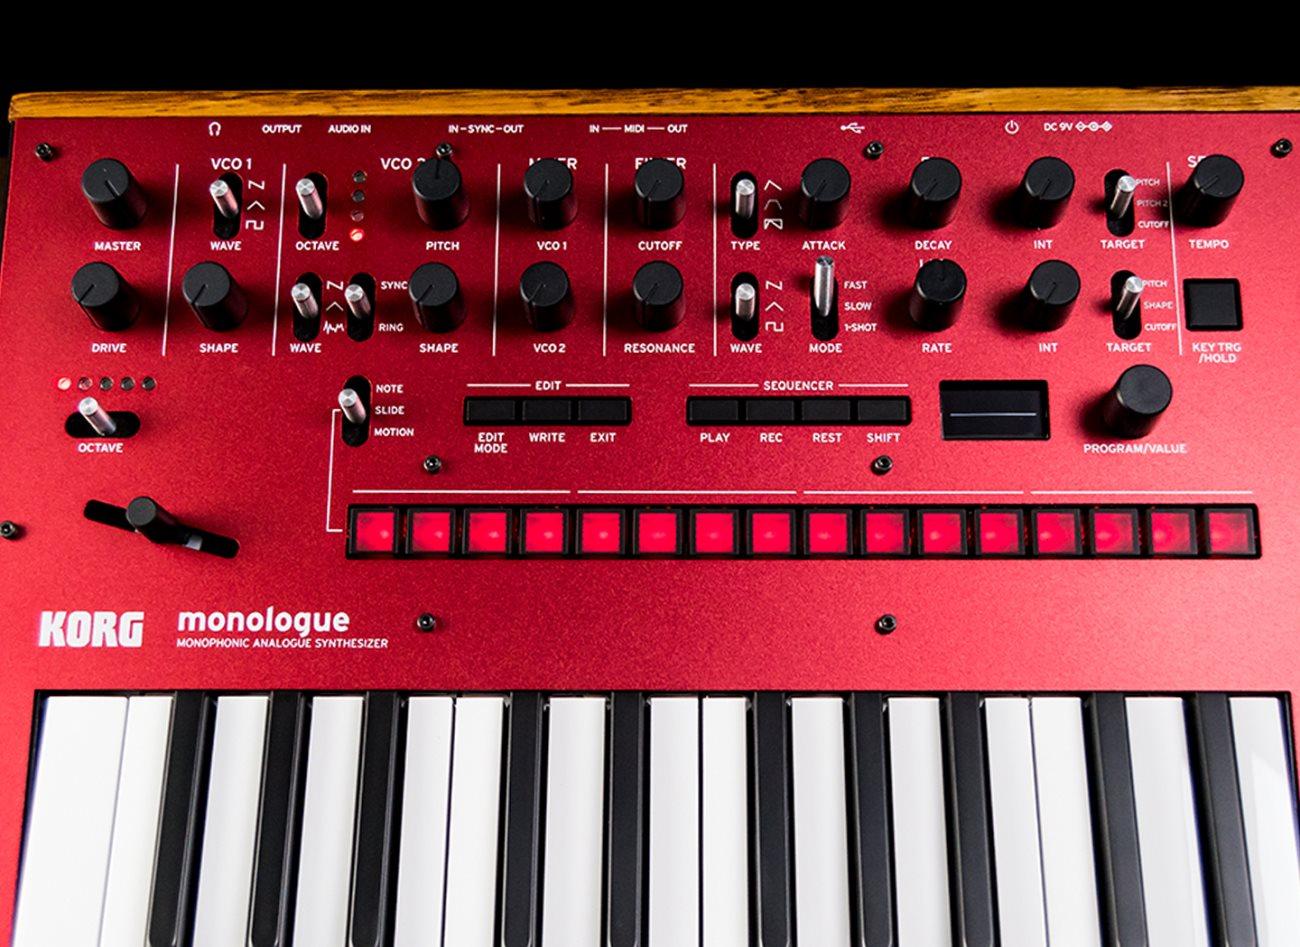 Korg monologue 25-Key Monophonic Analogue Synthesizer - Red